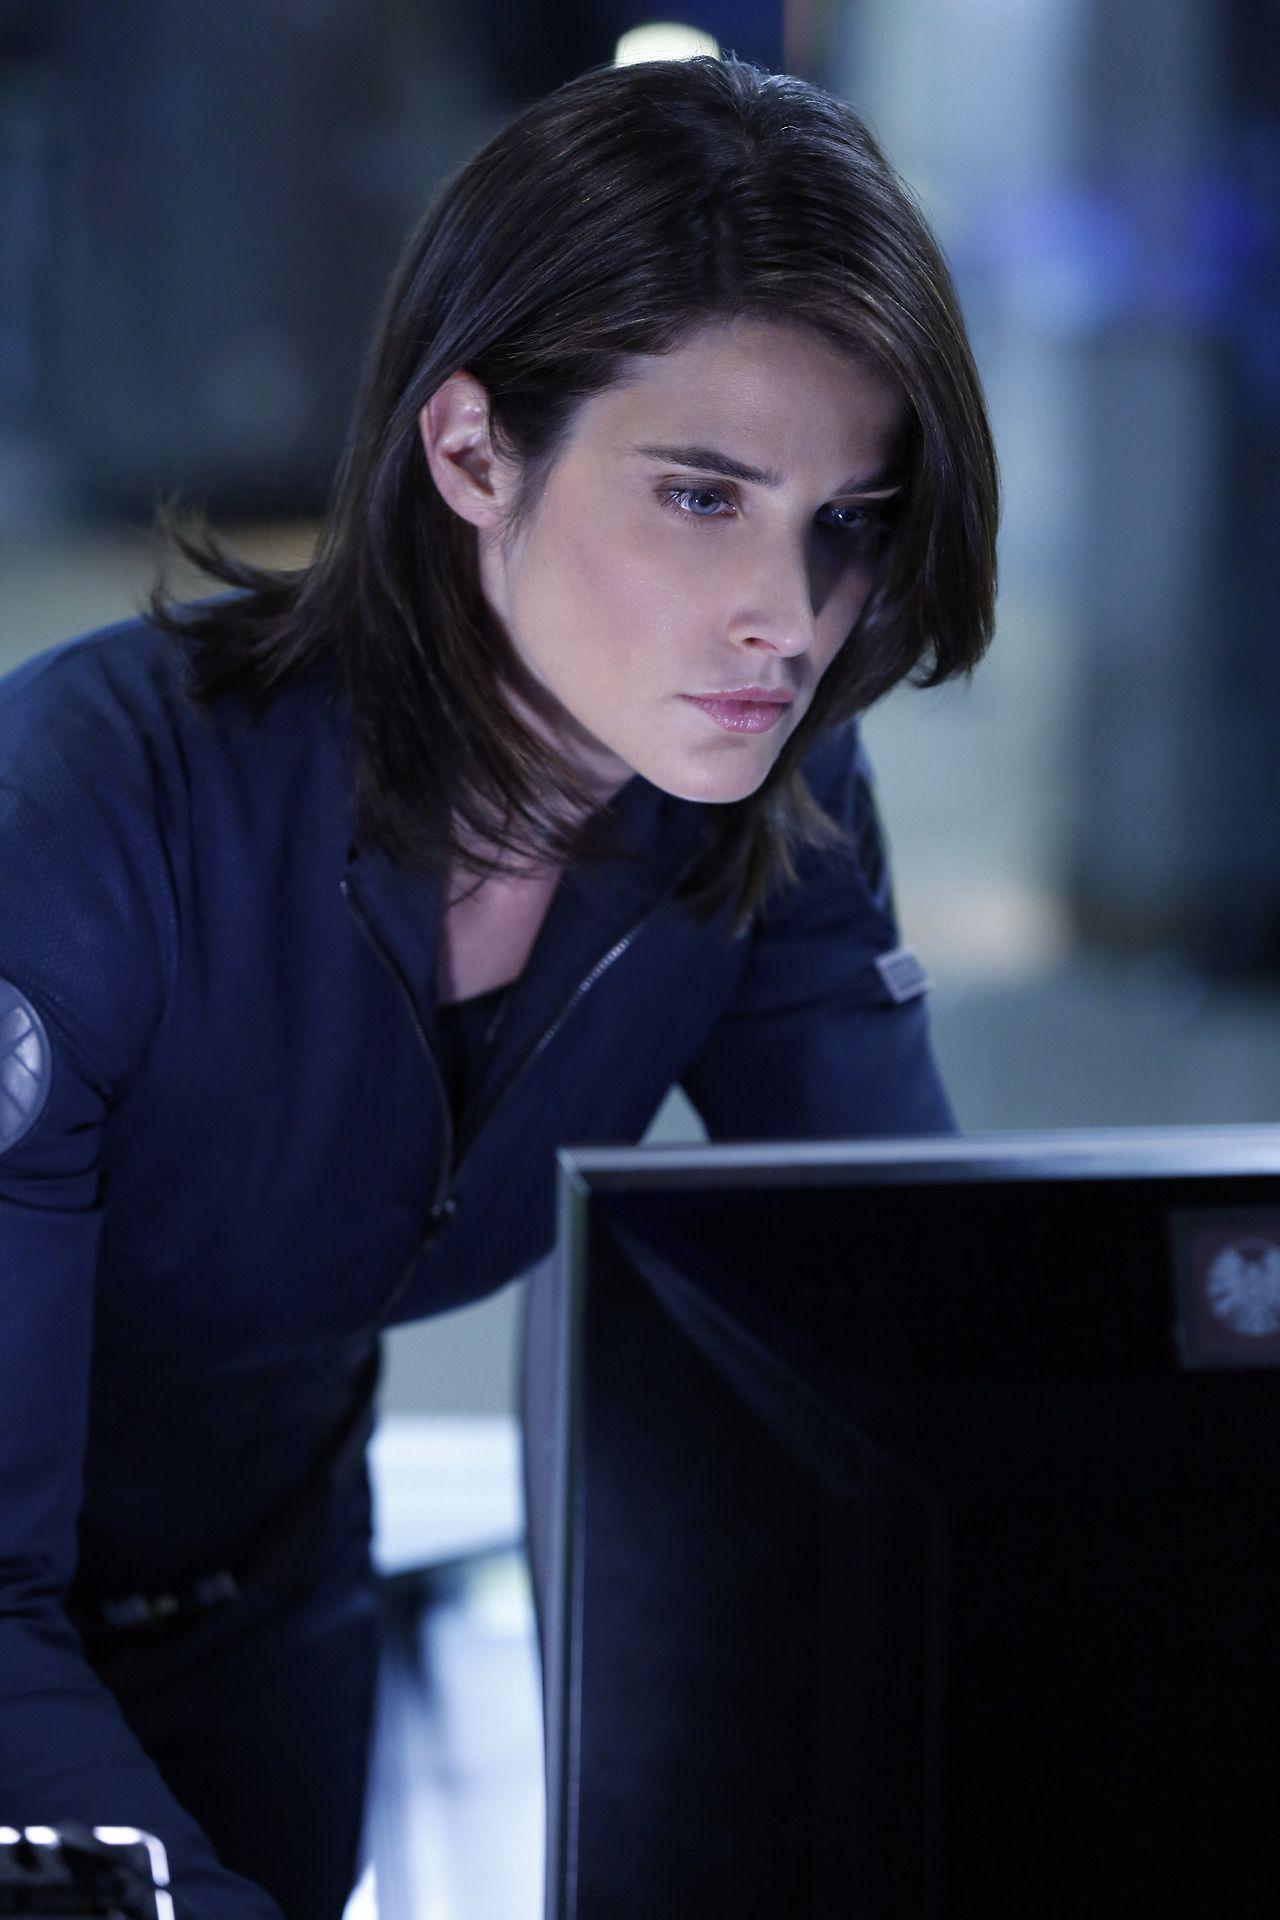 List of Agents of S.H.I.E.L.D. episodes